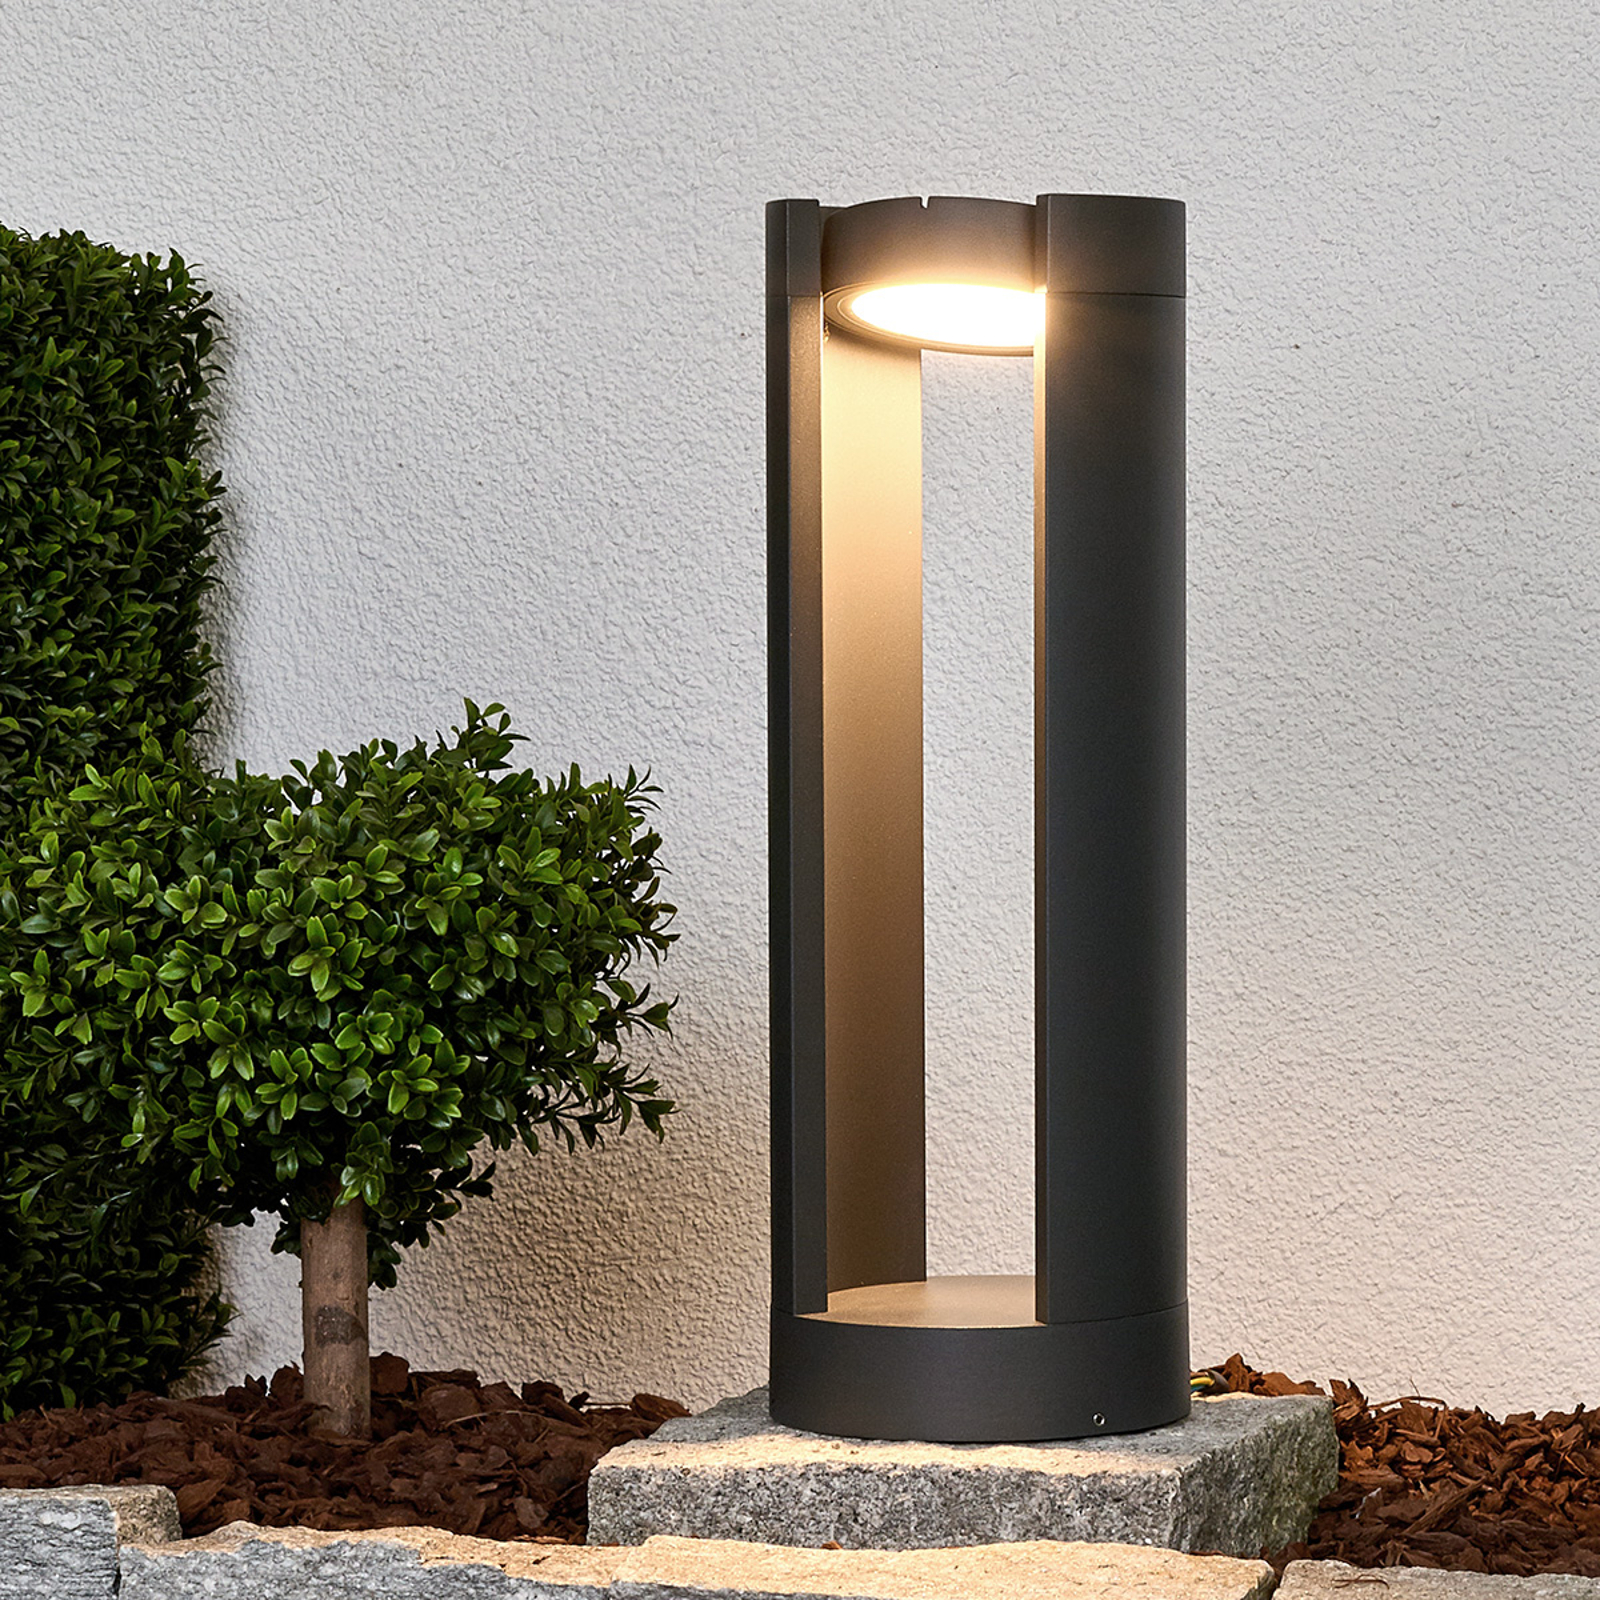 Justerbar sokkellampe Dylen med LED-lys